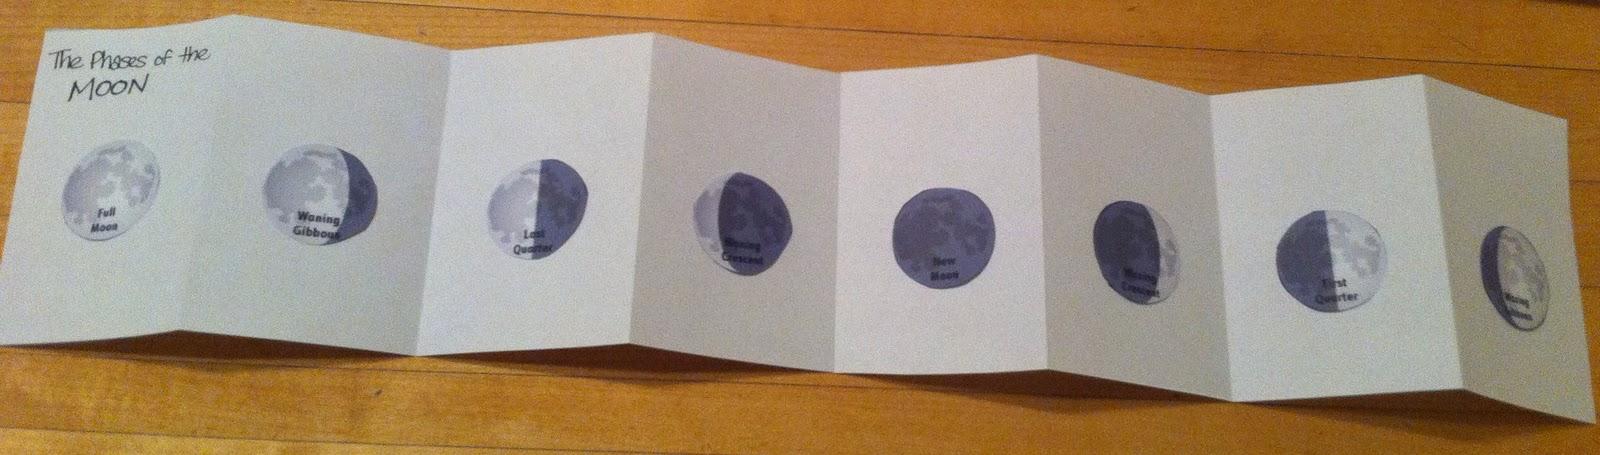 solar system foldable notebook - photo #30